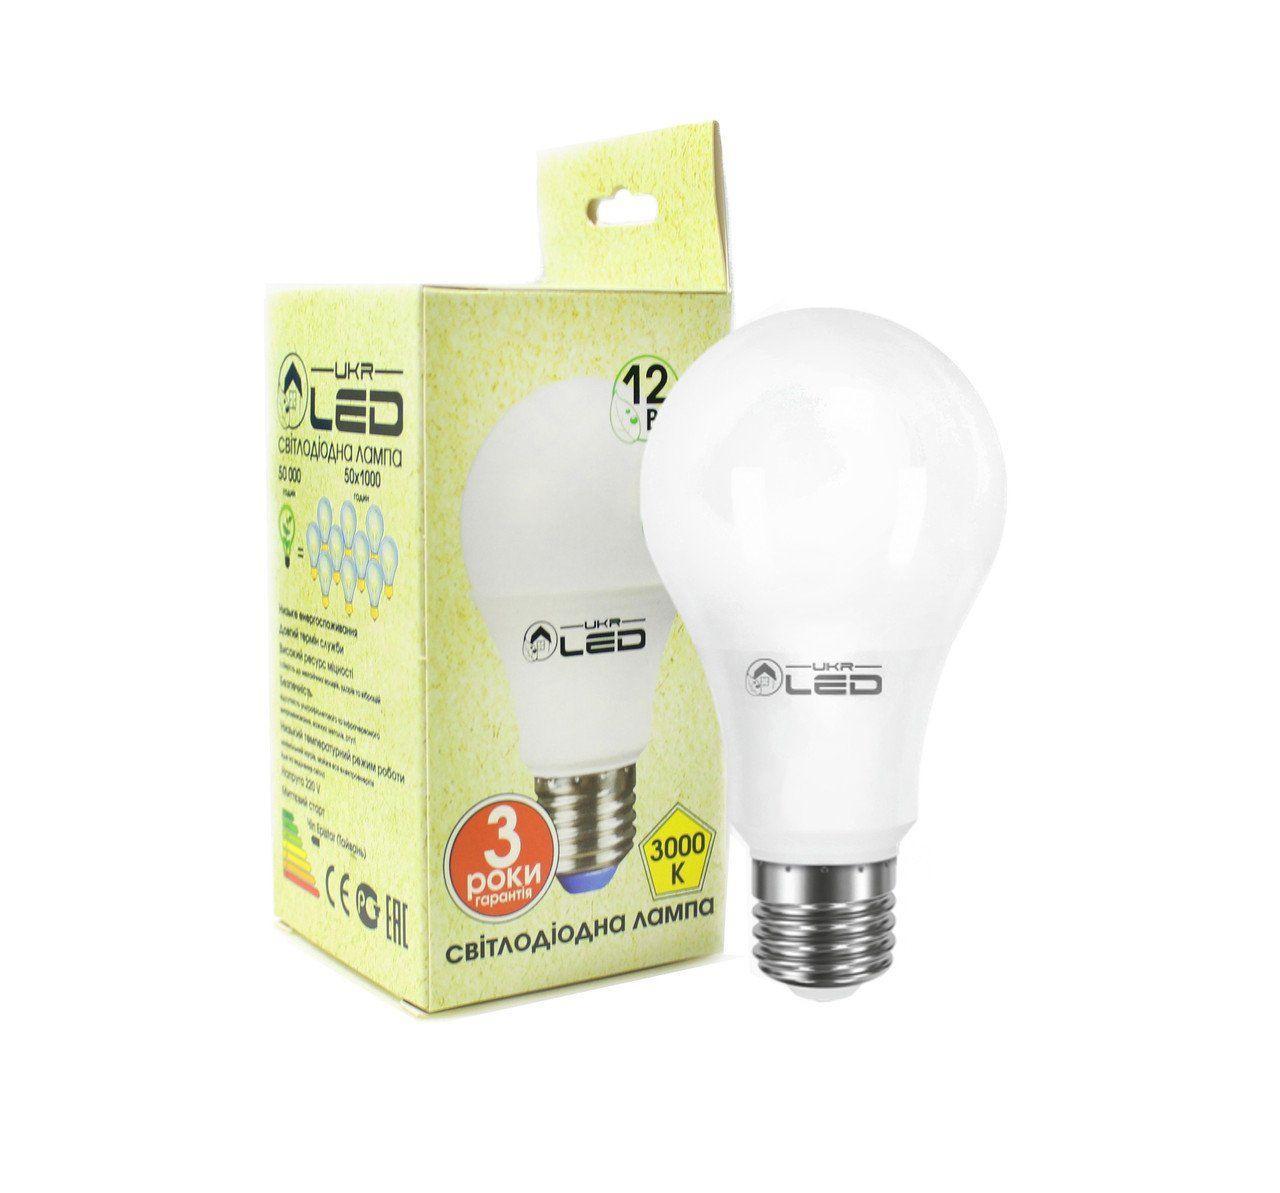 Светодиодная лампа UkrLed Е27 12W (груша) 4000К